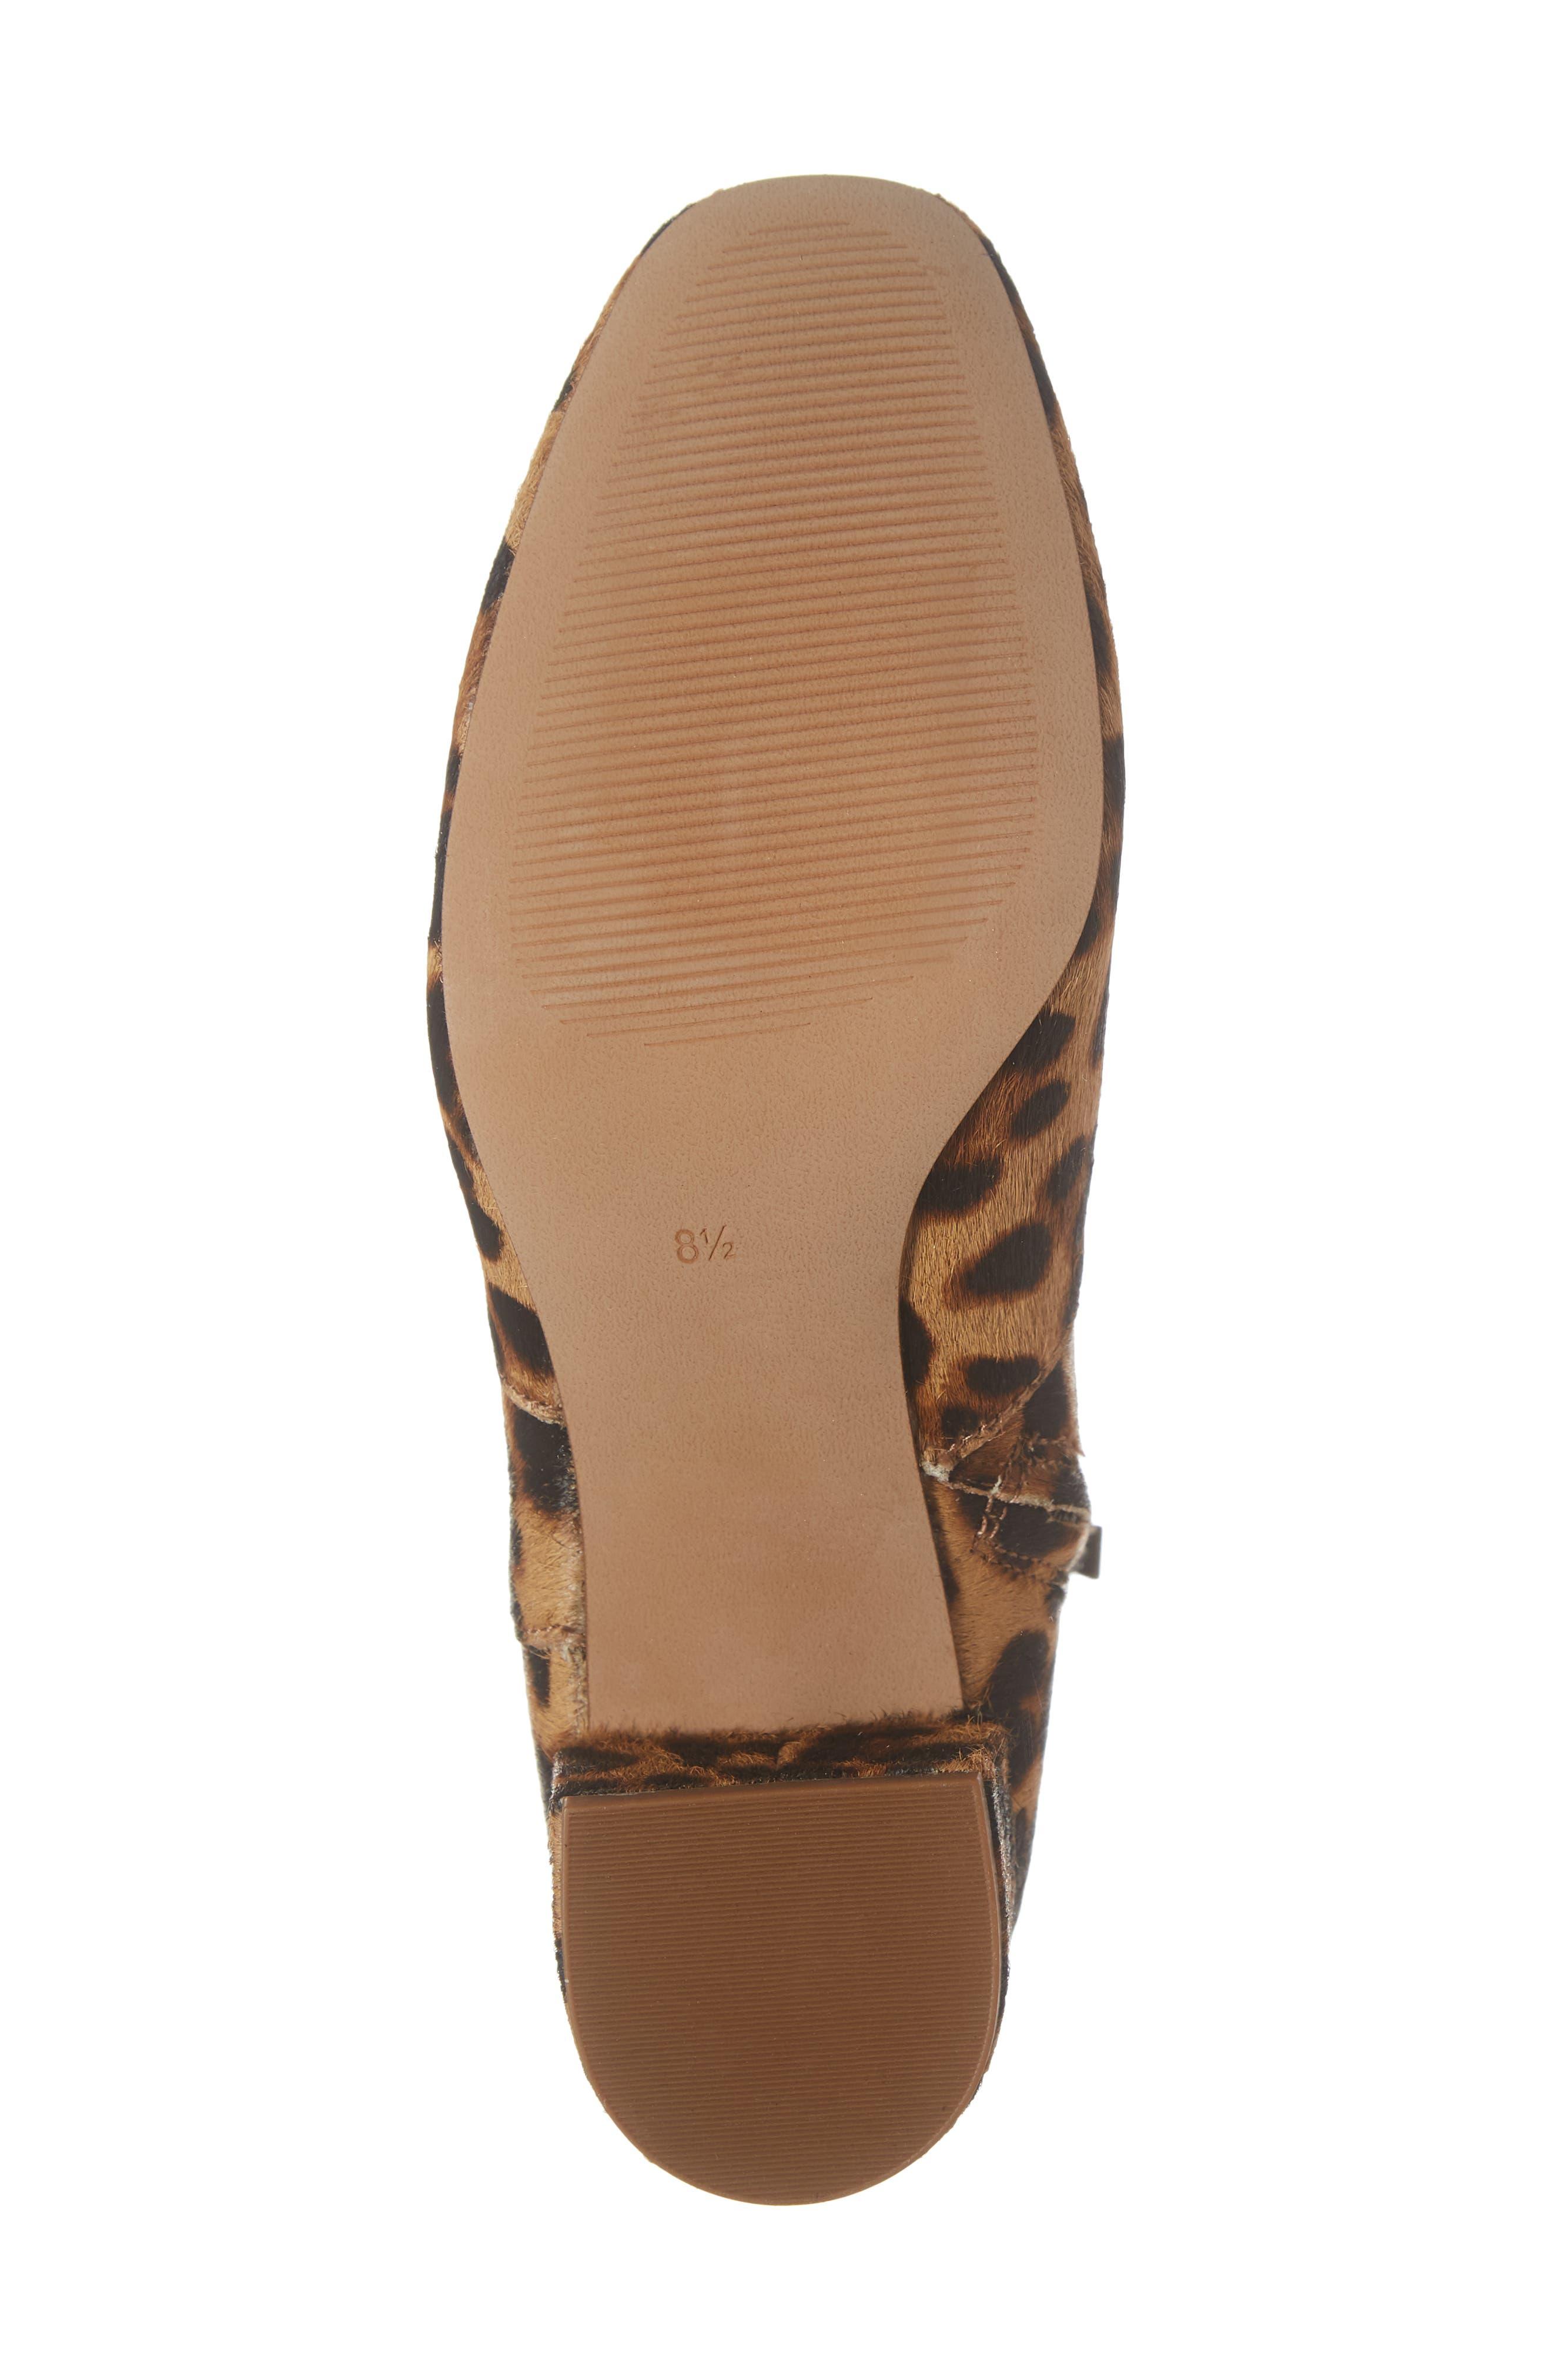 MADEWELL, The Jada Genuine Calf Hair Boot, Alternate thumbnail 6, color, 200